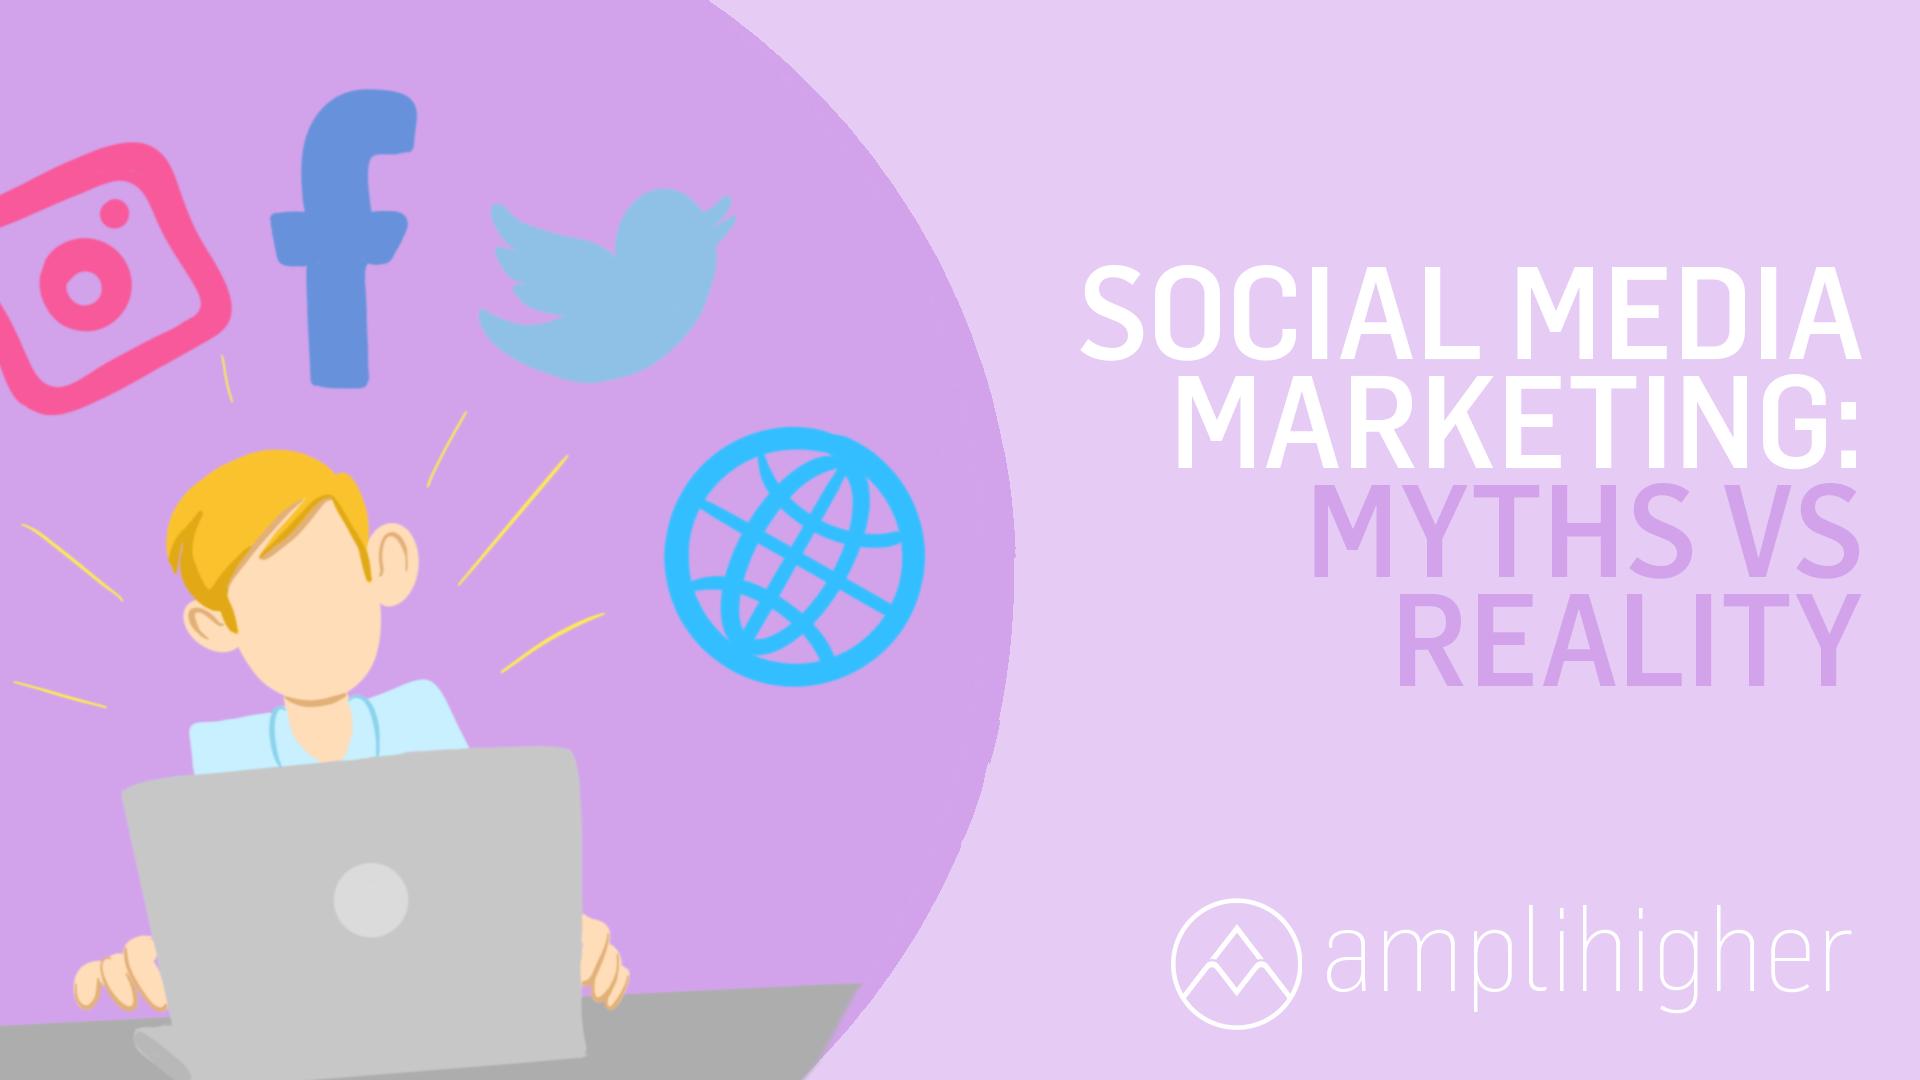 13 Social Media Marketing Myths: BUSTED